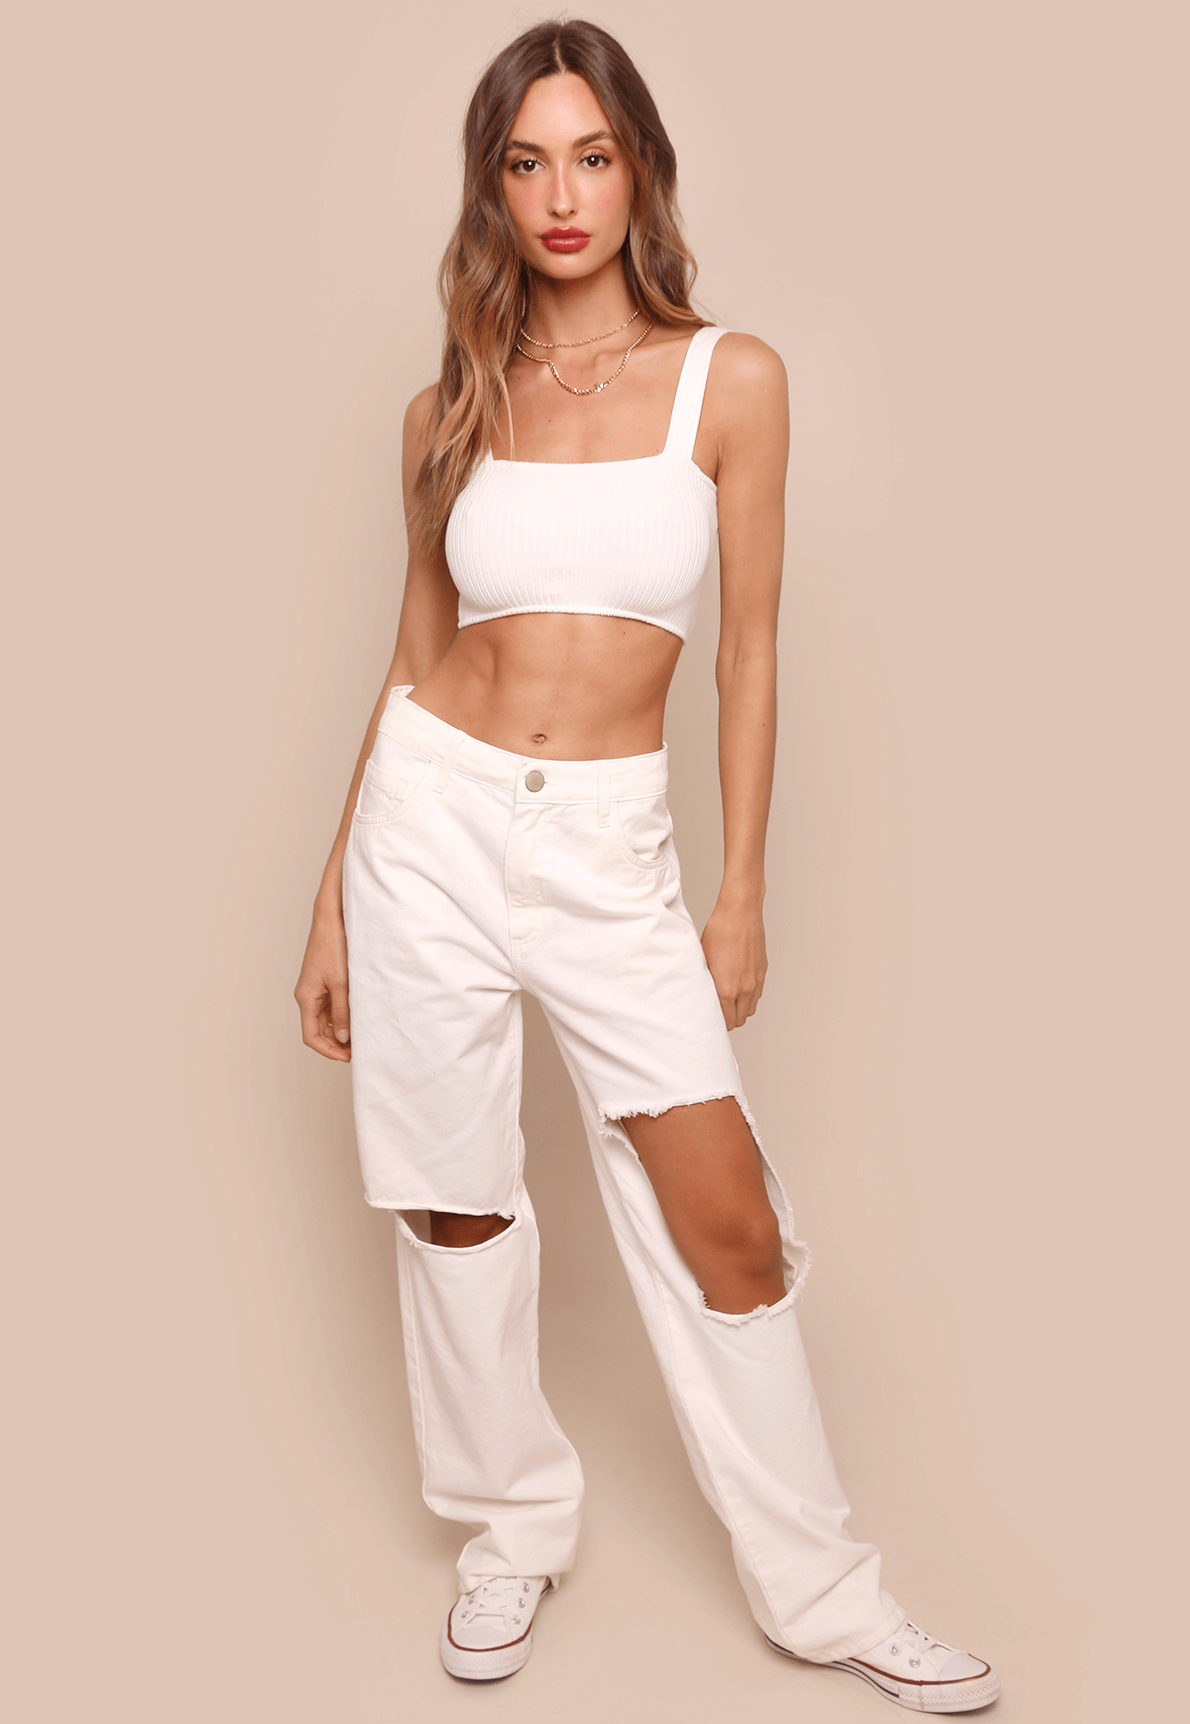 35896-calca-jeans-nina-branco-mundo-lolita-01